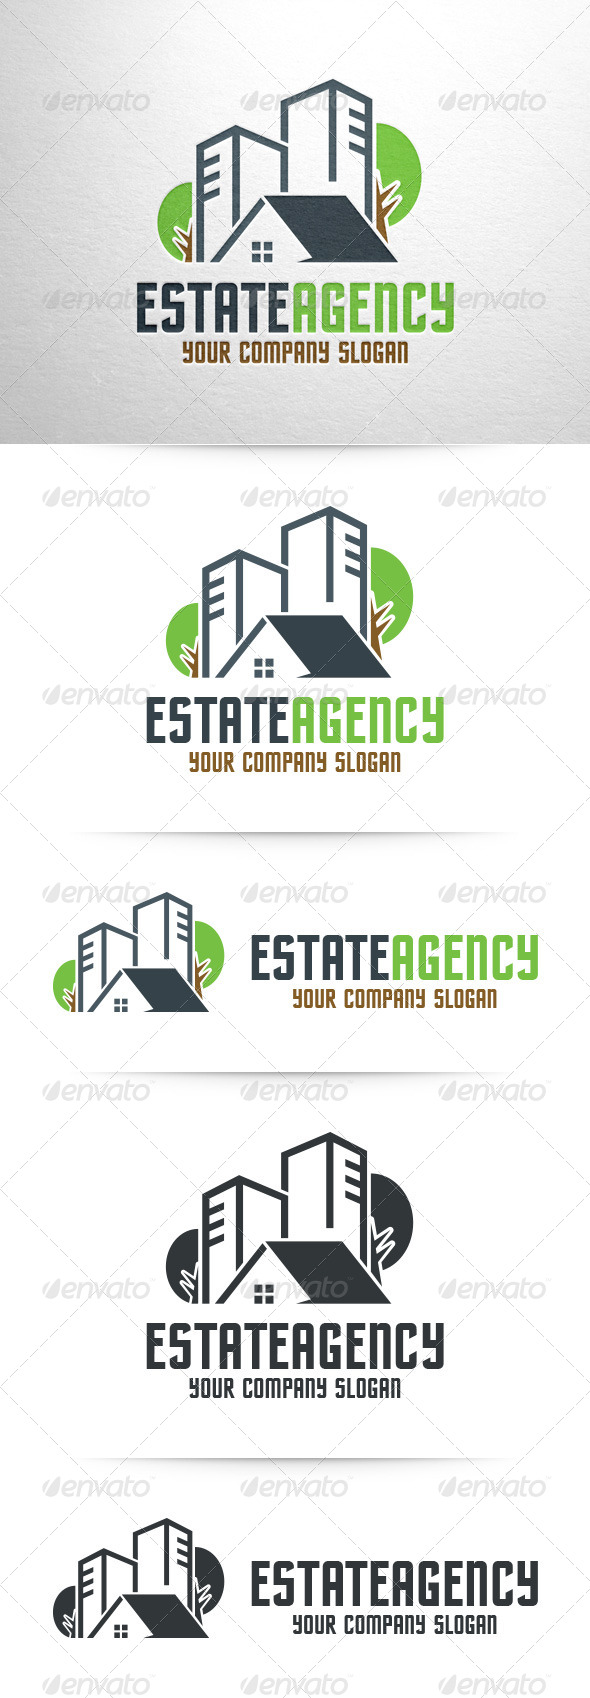 GraphicRiver Estate Agency Logo Template 7972604